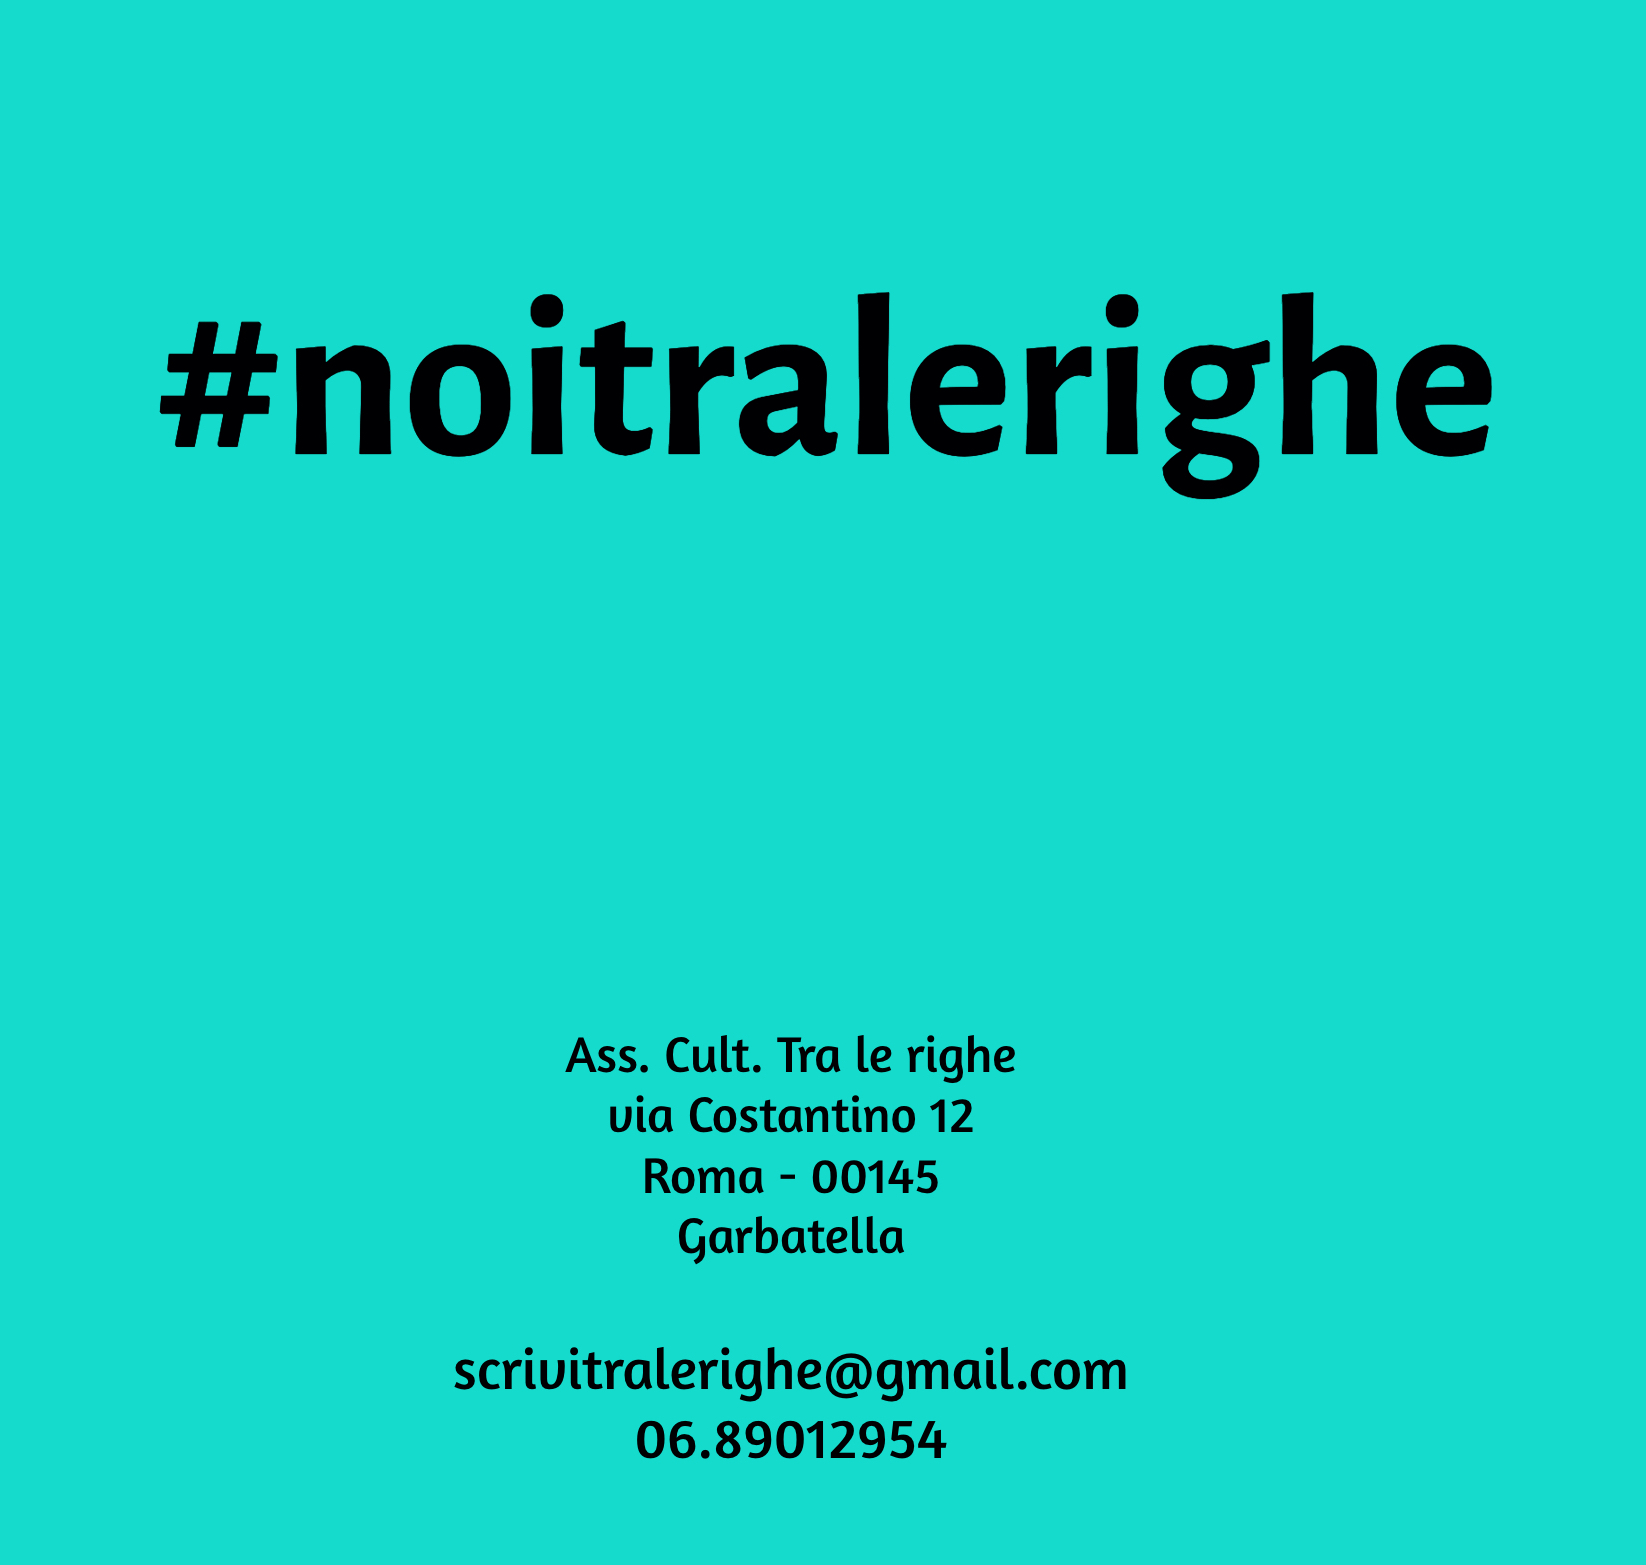 #noitralergihe